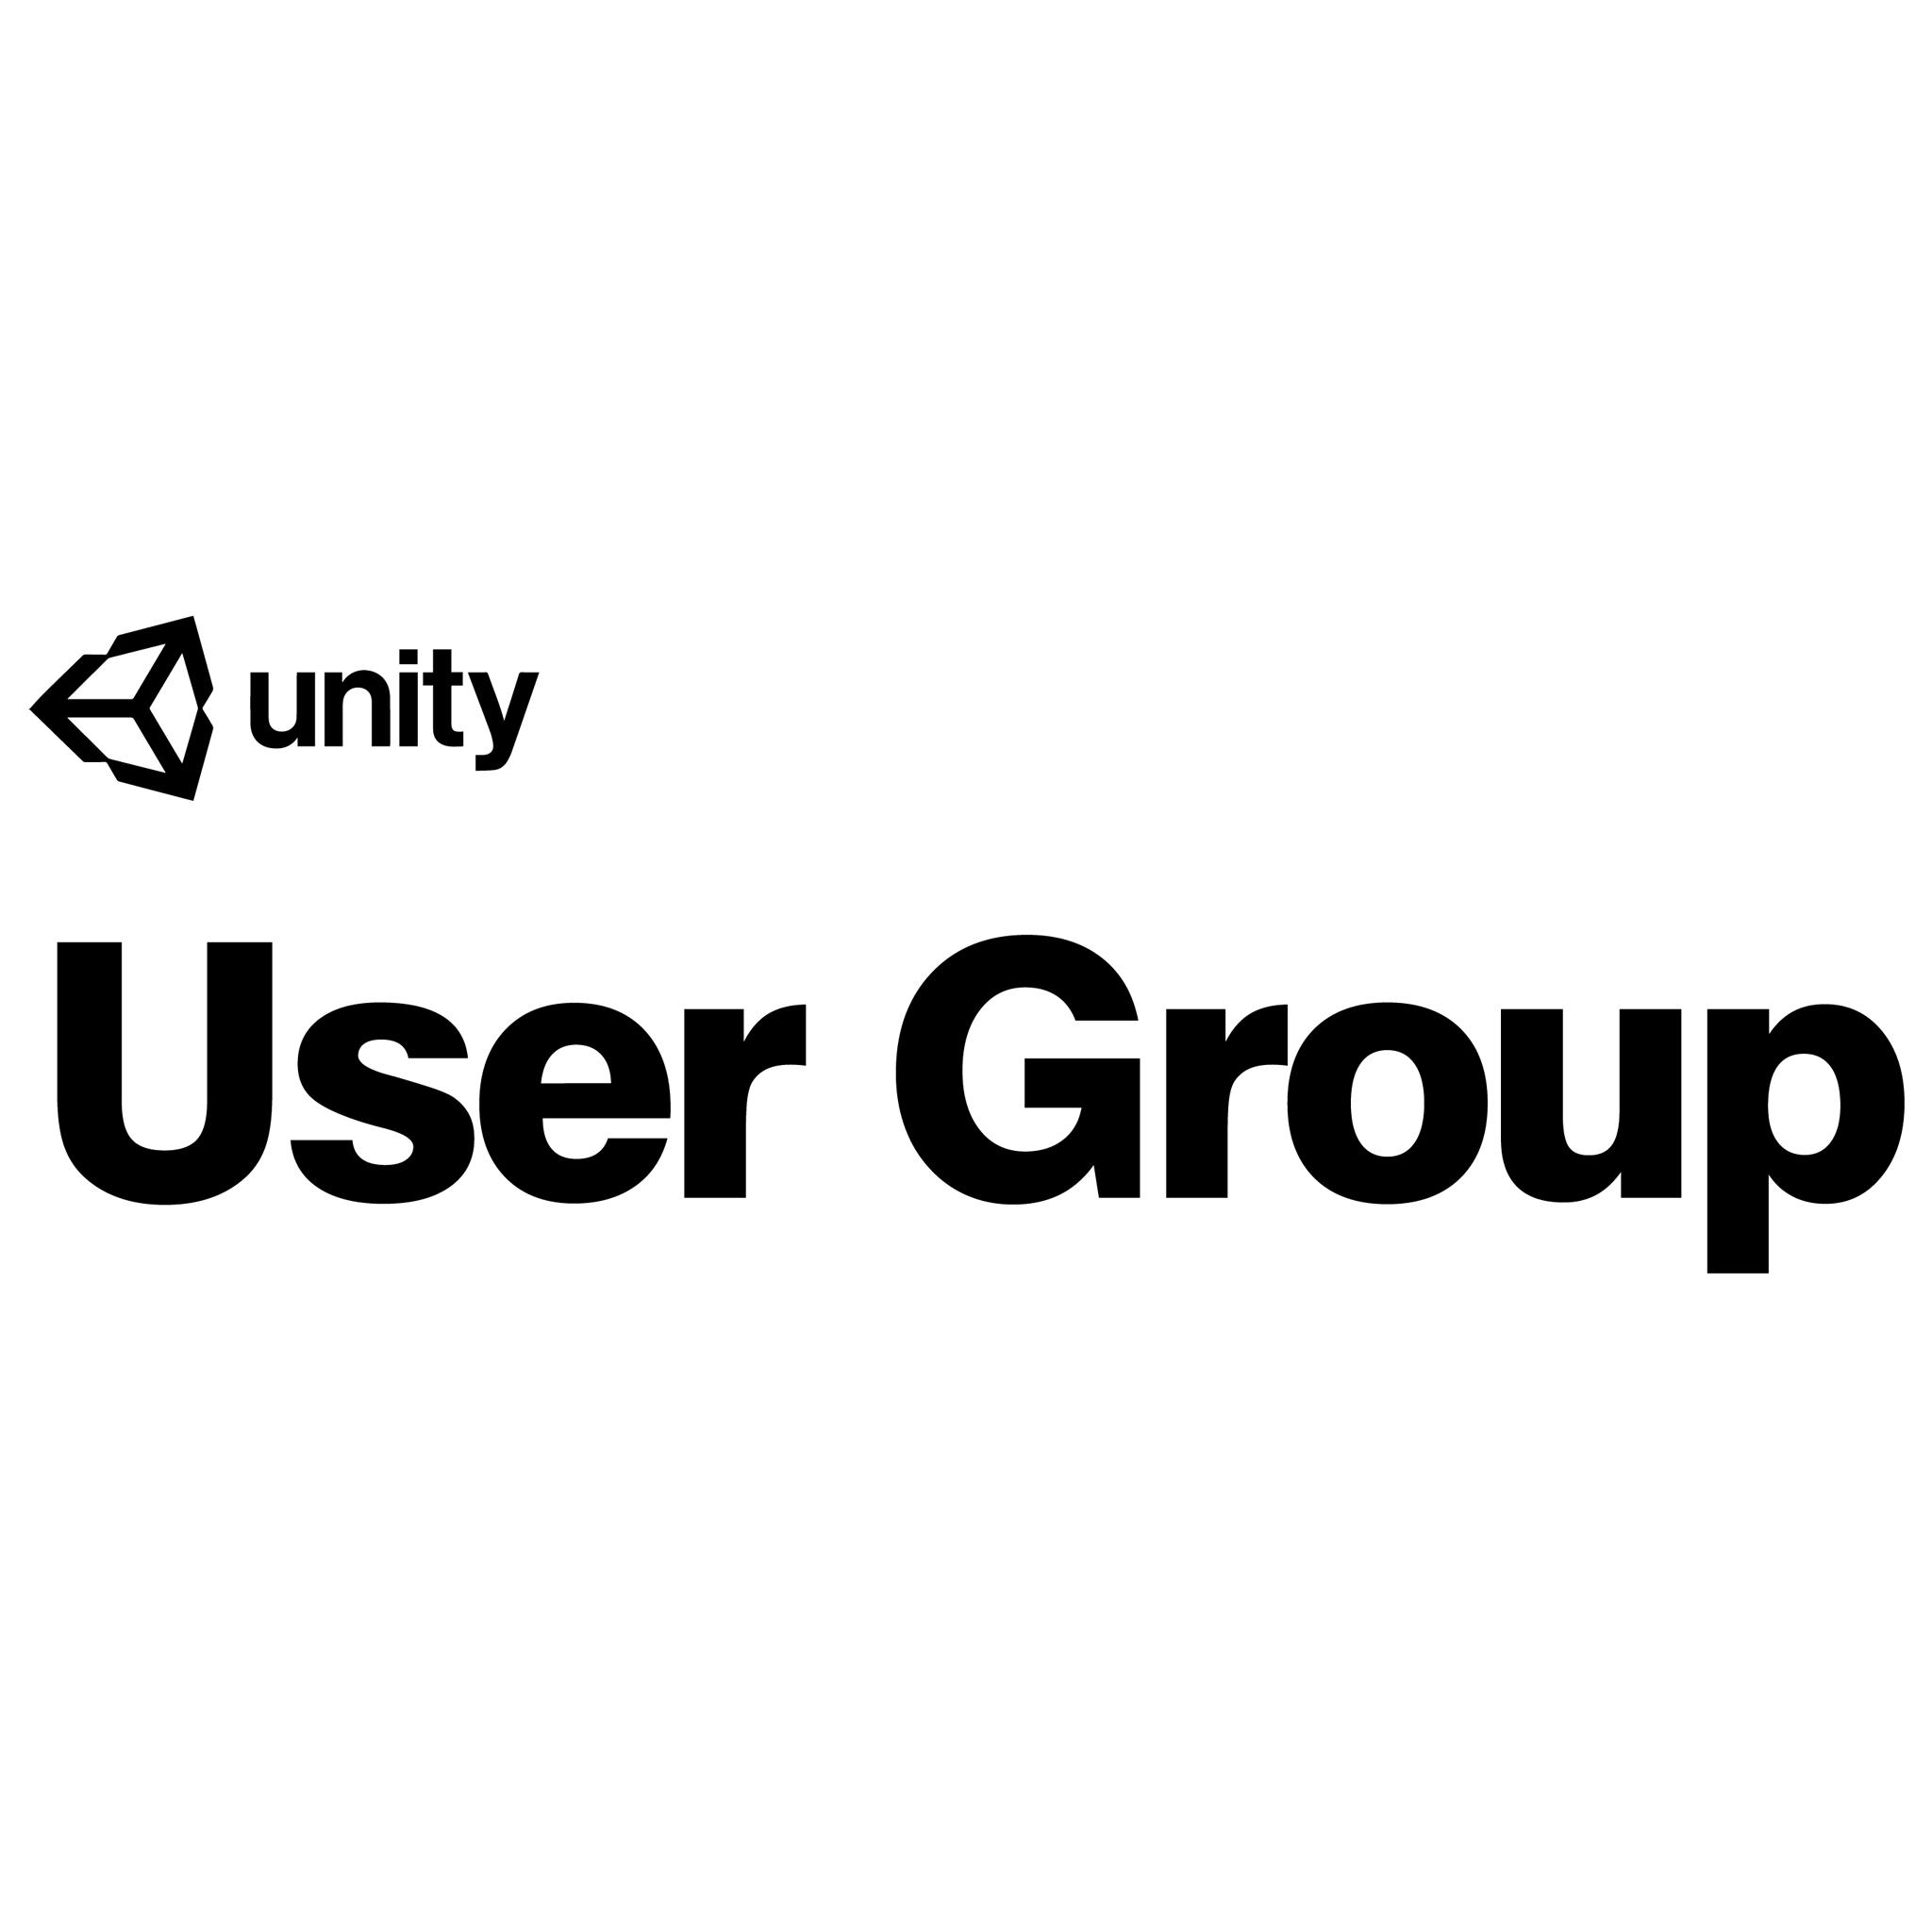 UUG 广州站 - Unity 机器学习技术分享会